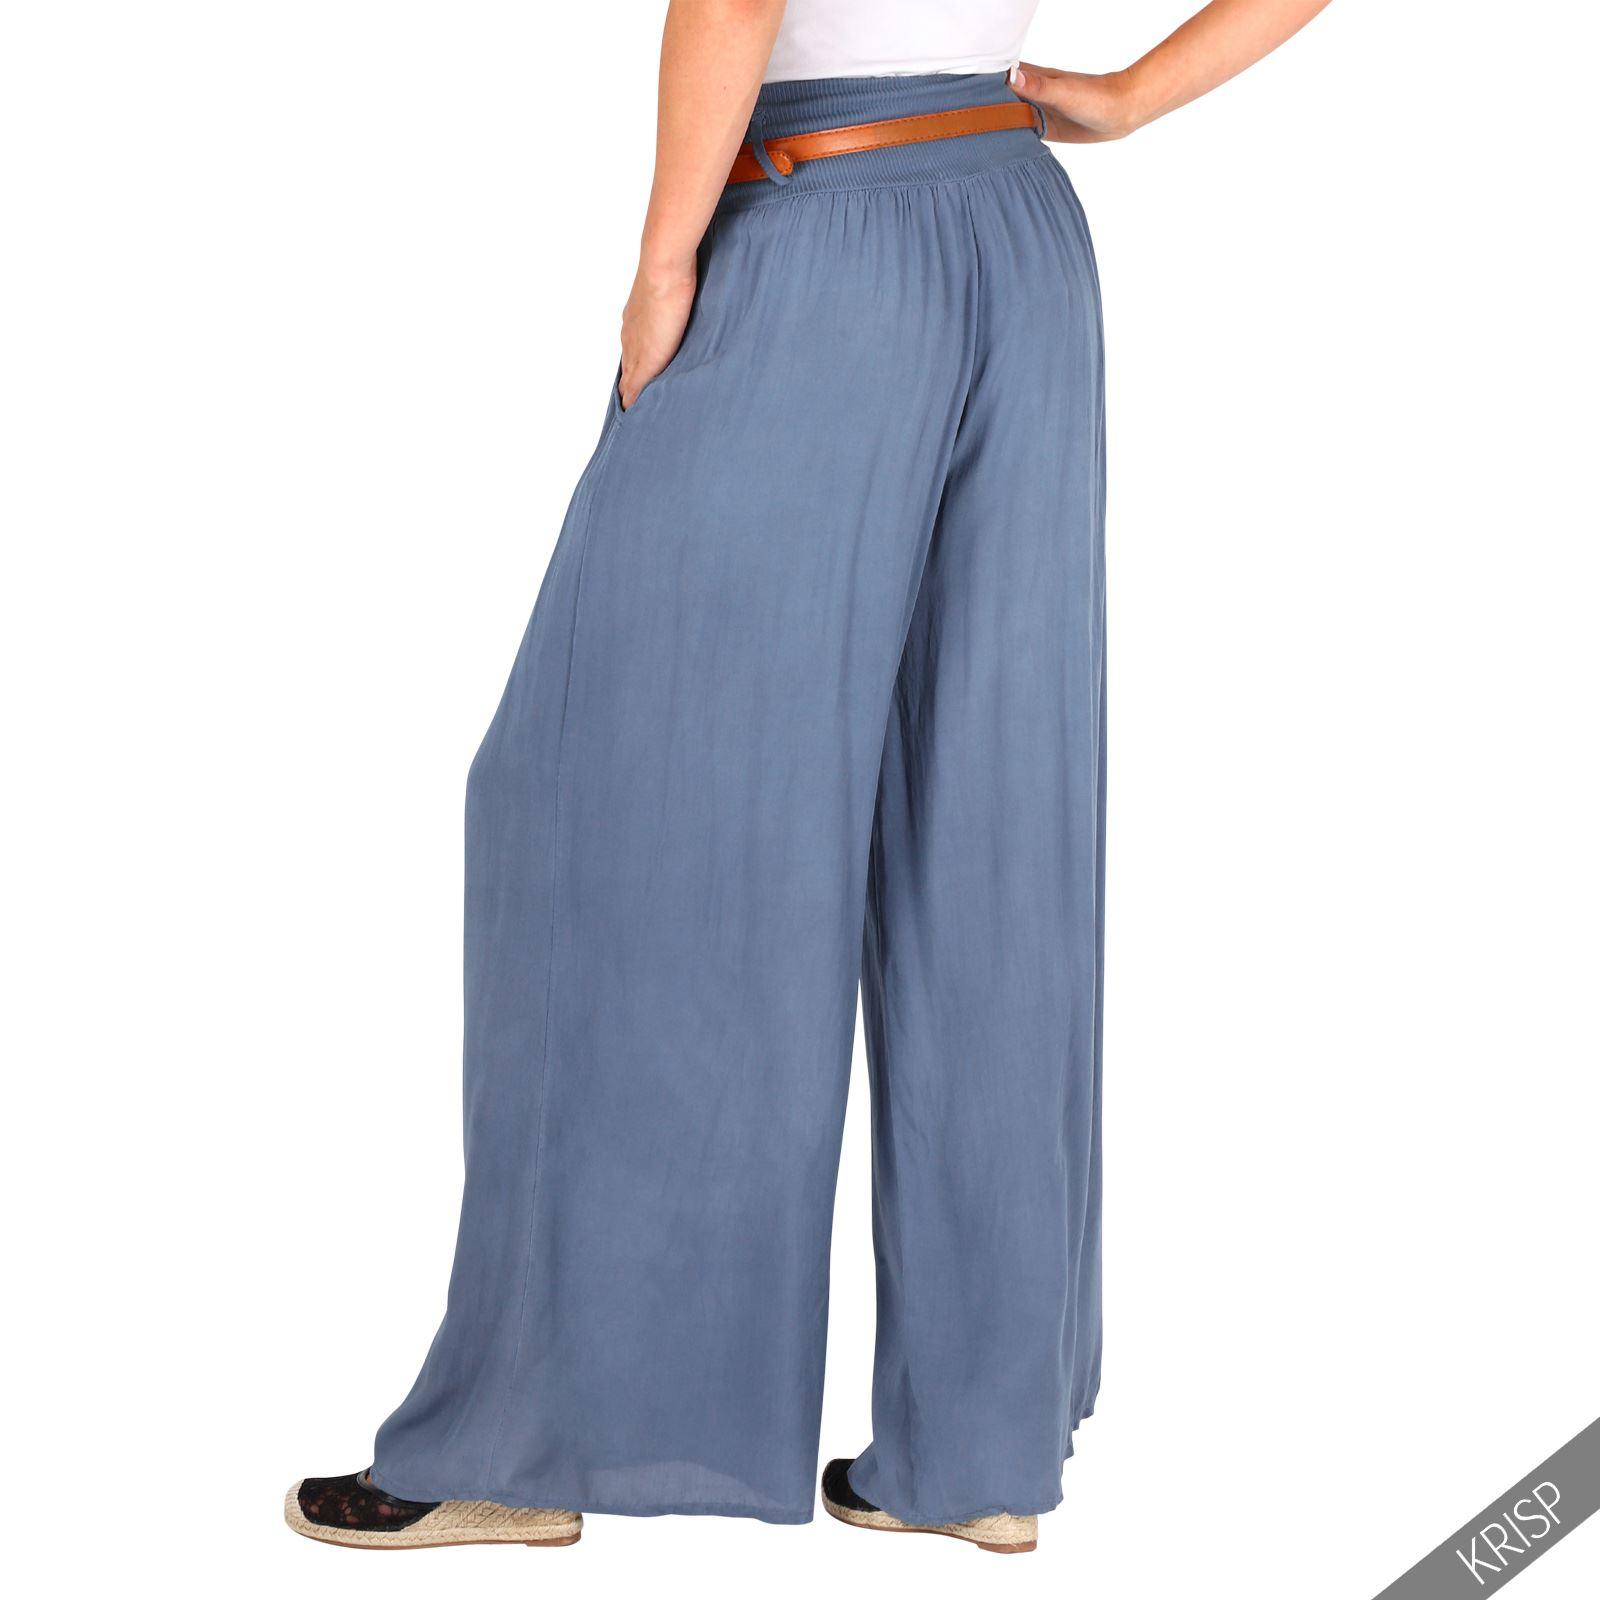 Pantalones-Mujer-Verano-2017-Ancho-Bombachos-Vestir-Algodon-Tela-Elegantes-Moda